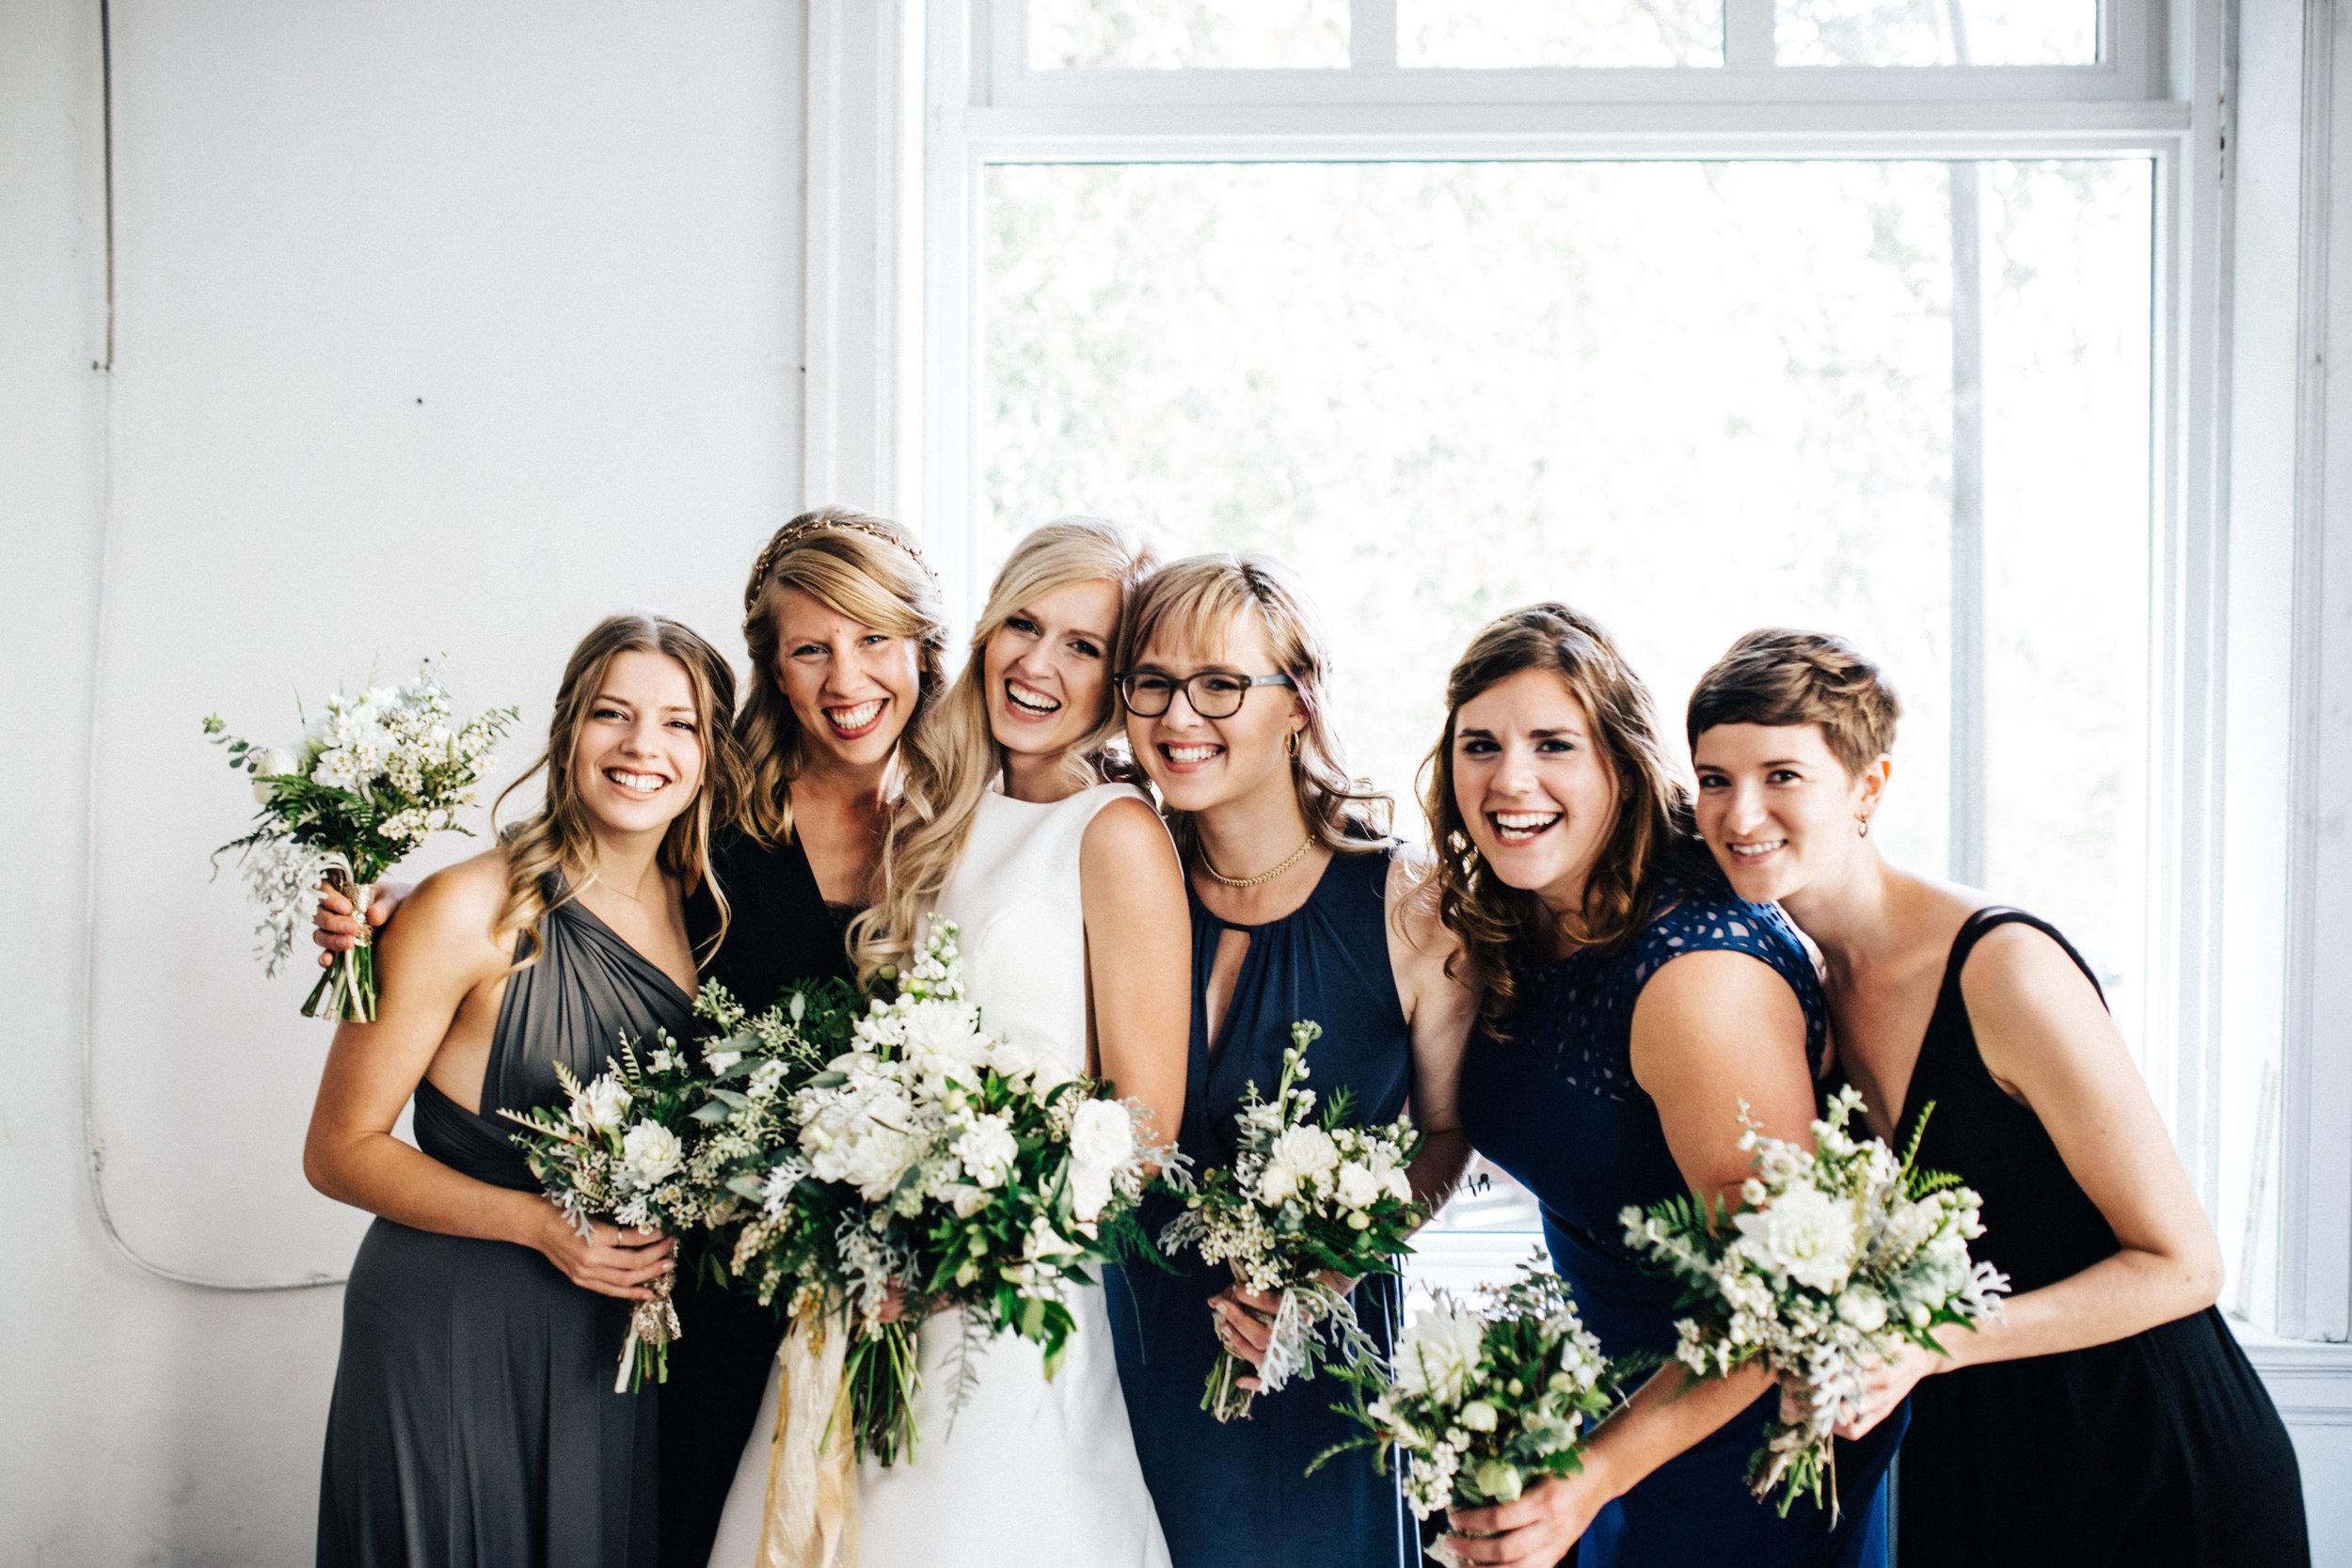 LainaDavid-WeddingParty-0051.jpg